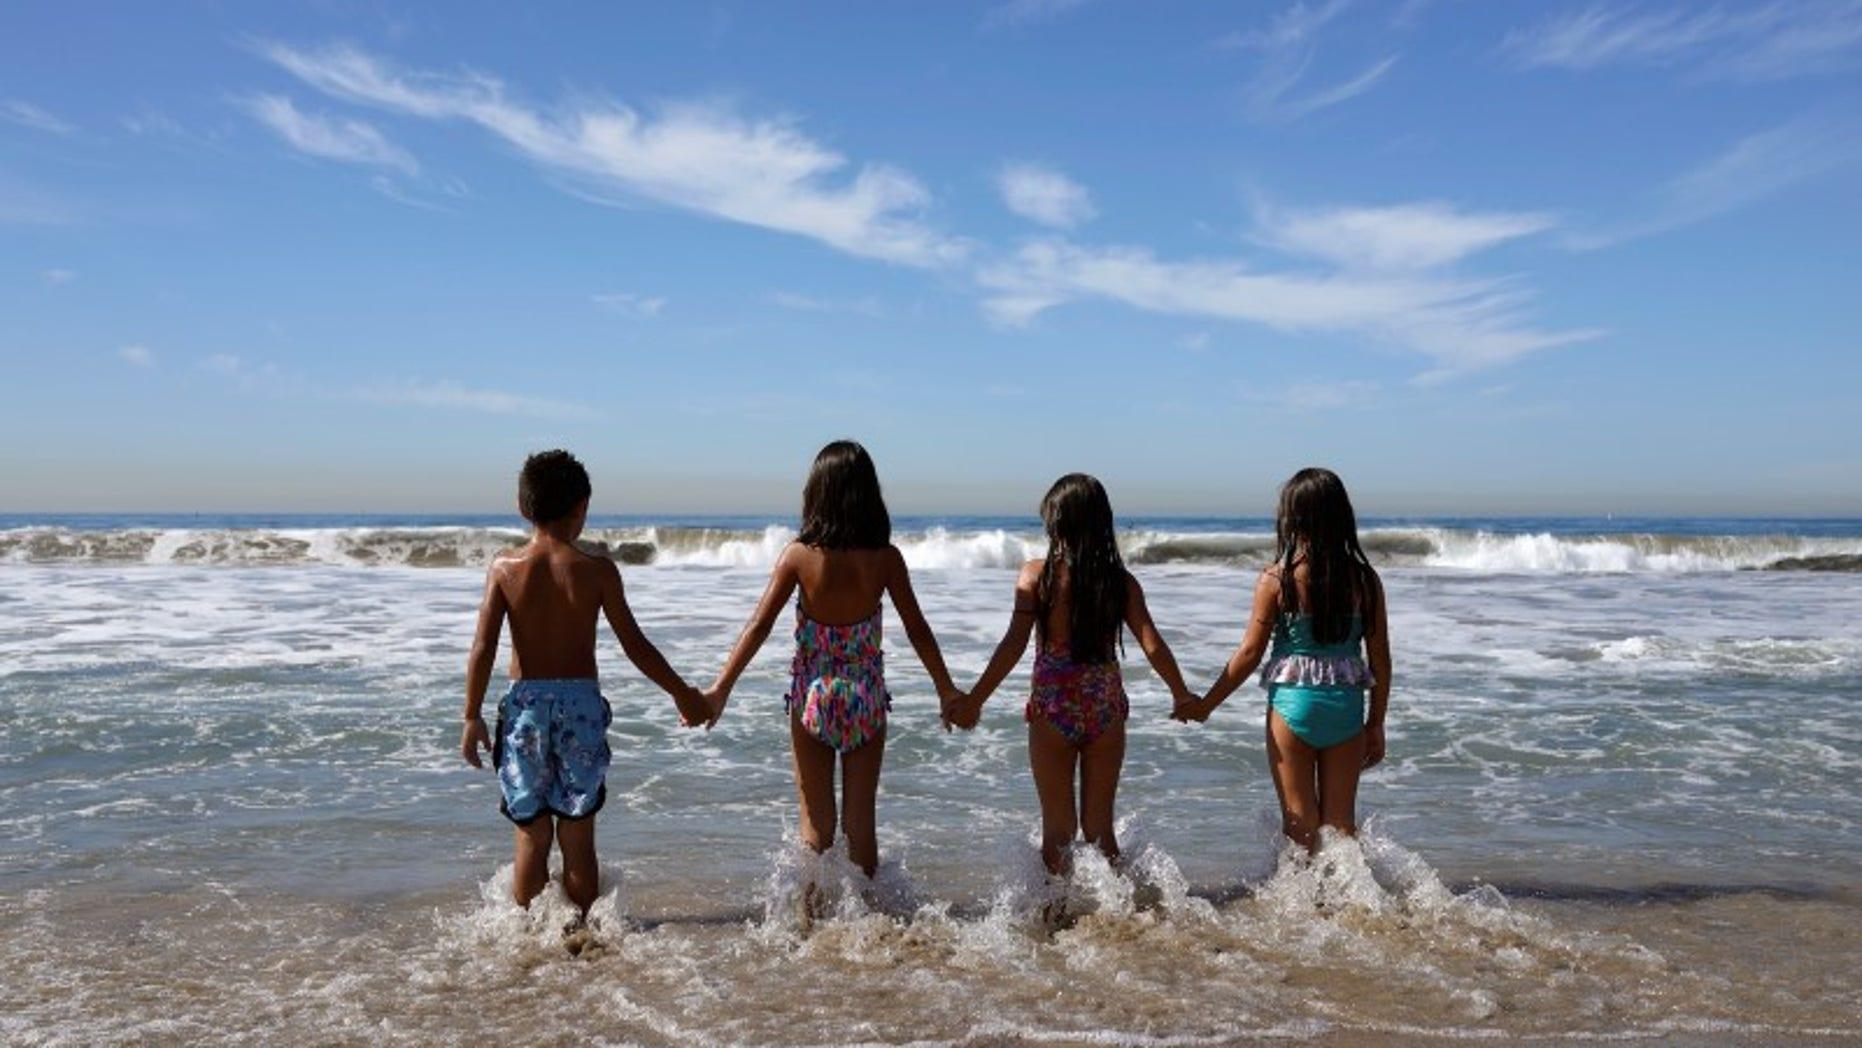 Children walk into the Pacific Ocean in Santa Monica